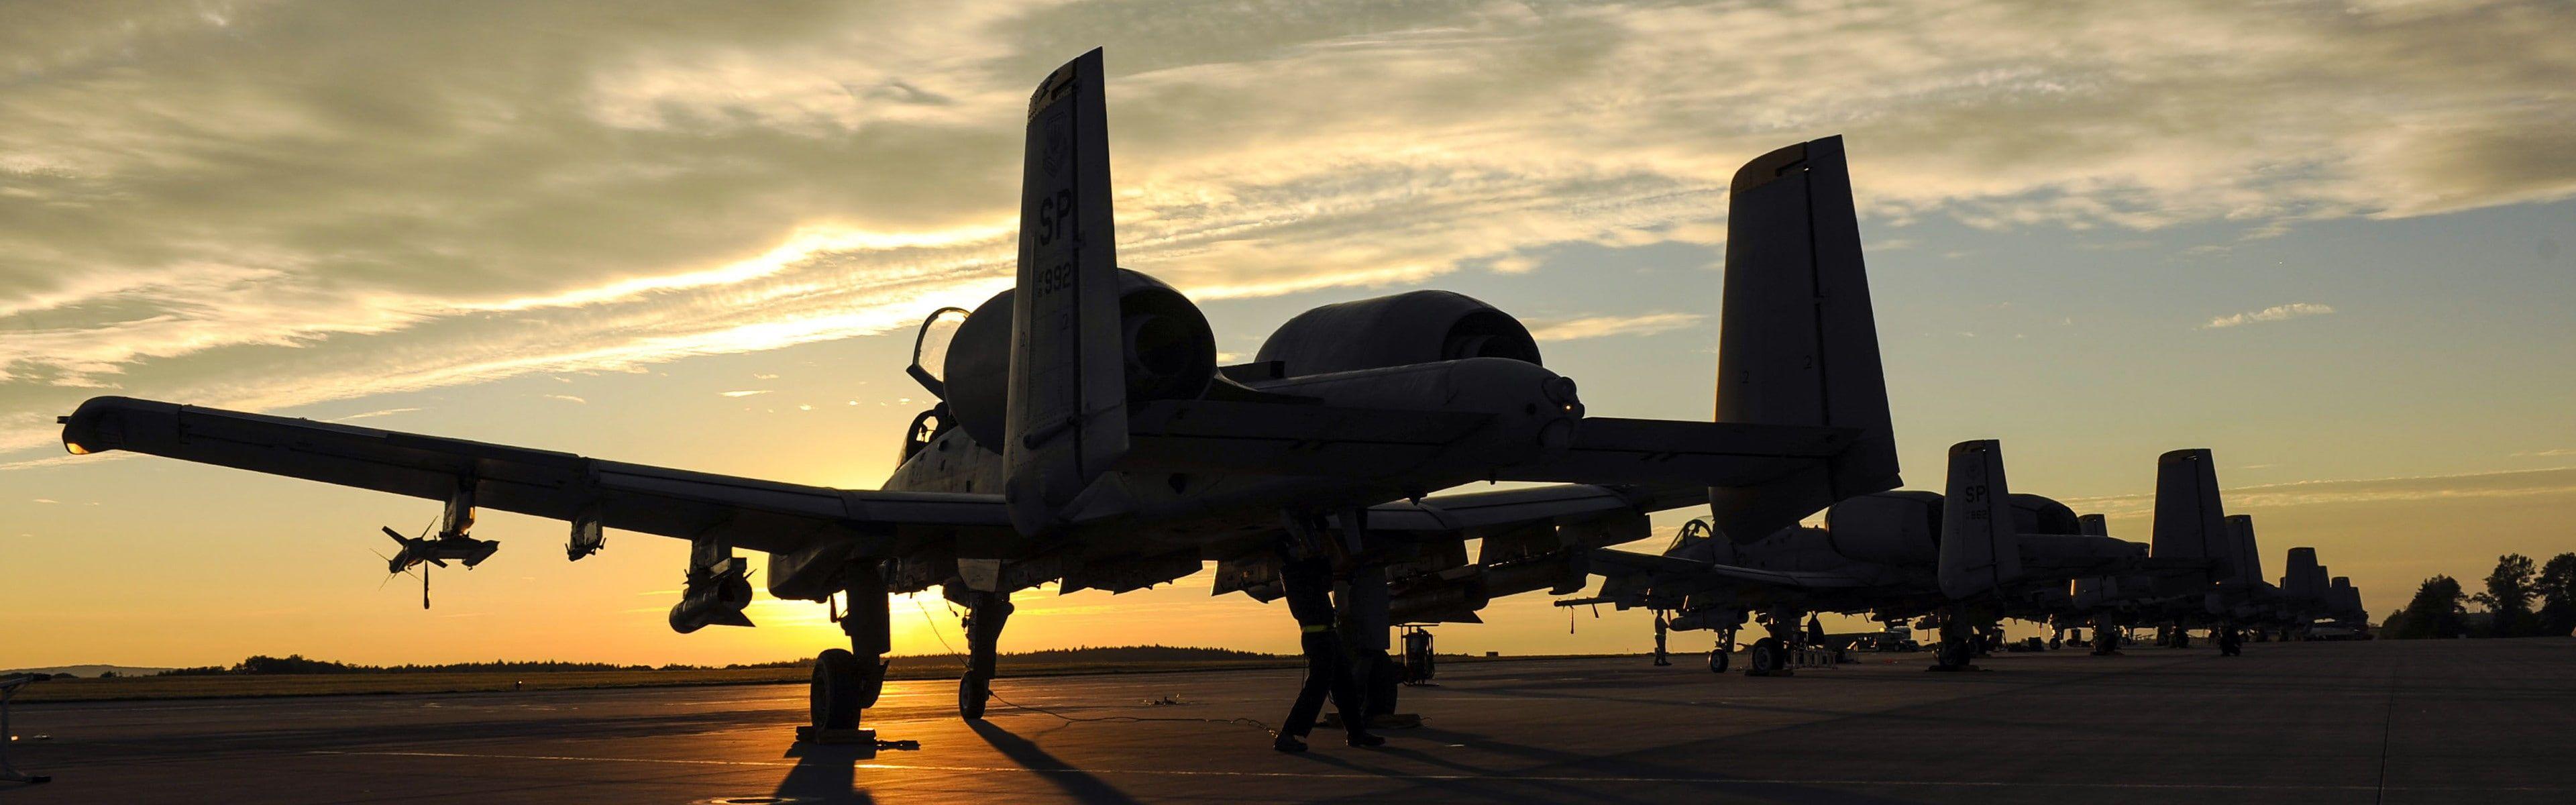 Fairchild A 10 Thunderbolt Ii Sunset Military Aircraft Aircraft Dual Monitors Multiple Display 4k Wallpap In 2021 Military Aircraft Aircraft Dual Monitor Wallpaper